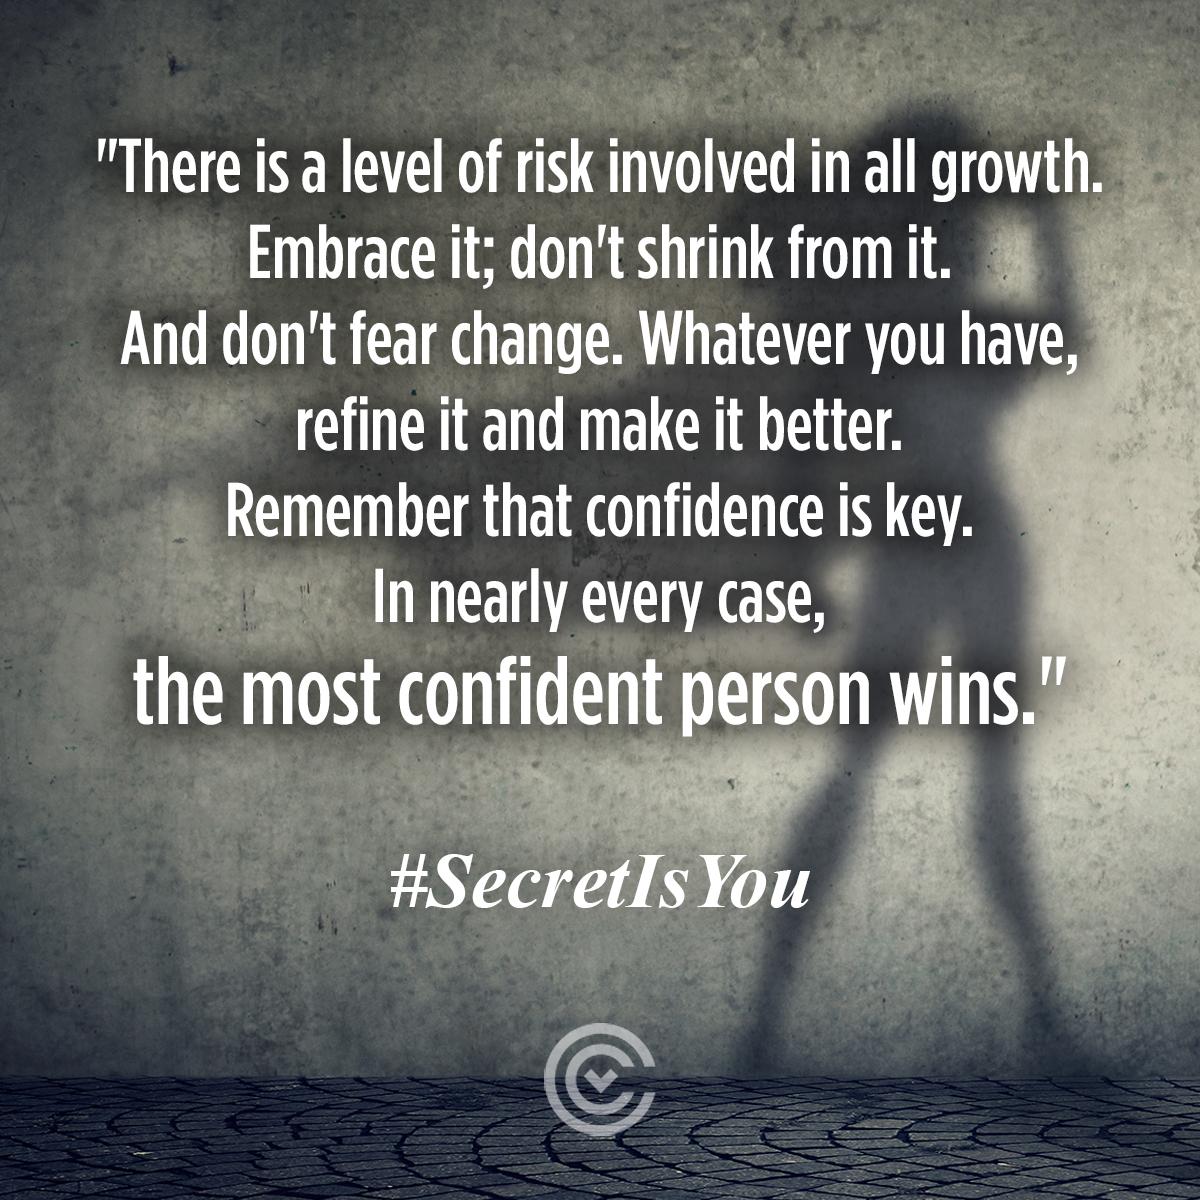 #secretisyou